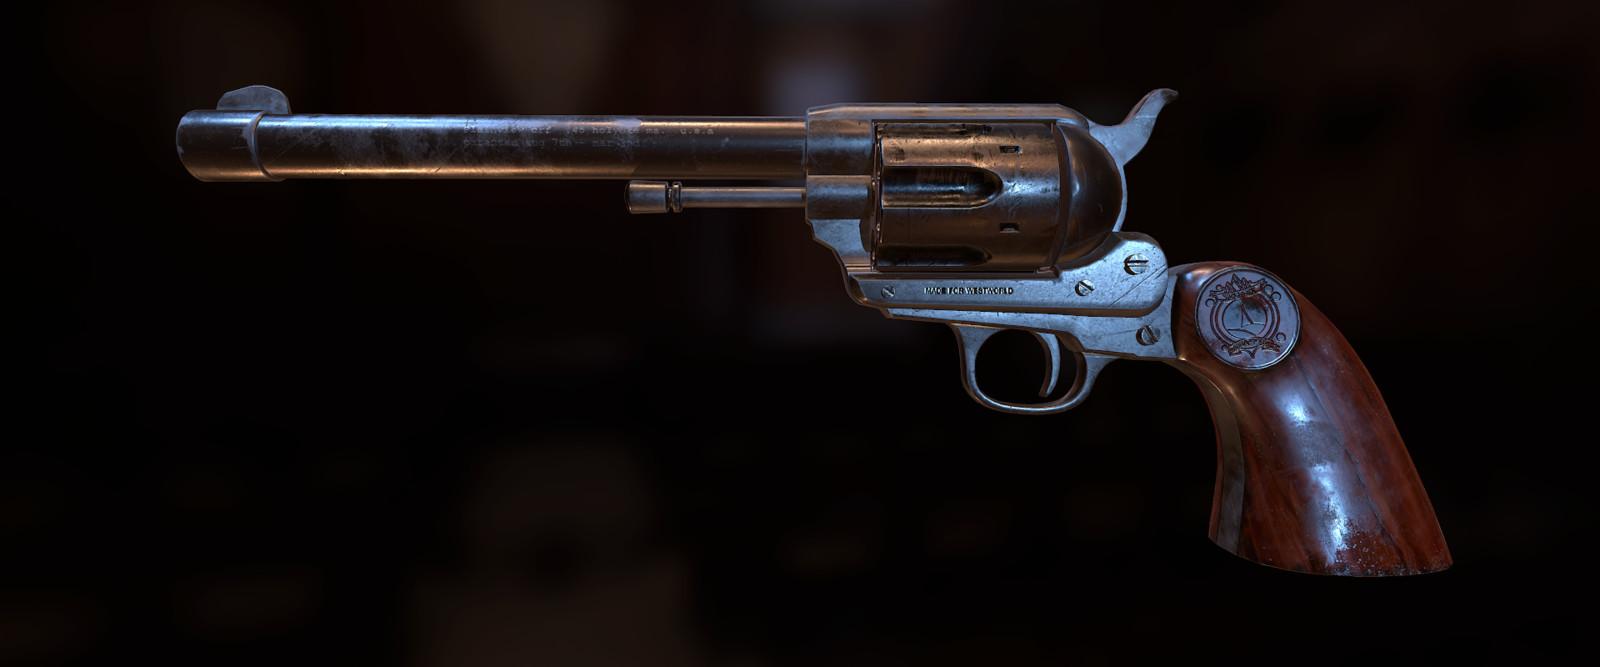 Westworld VR |Grey Revolver